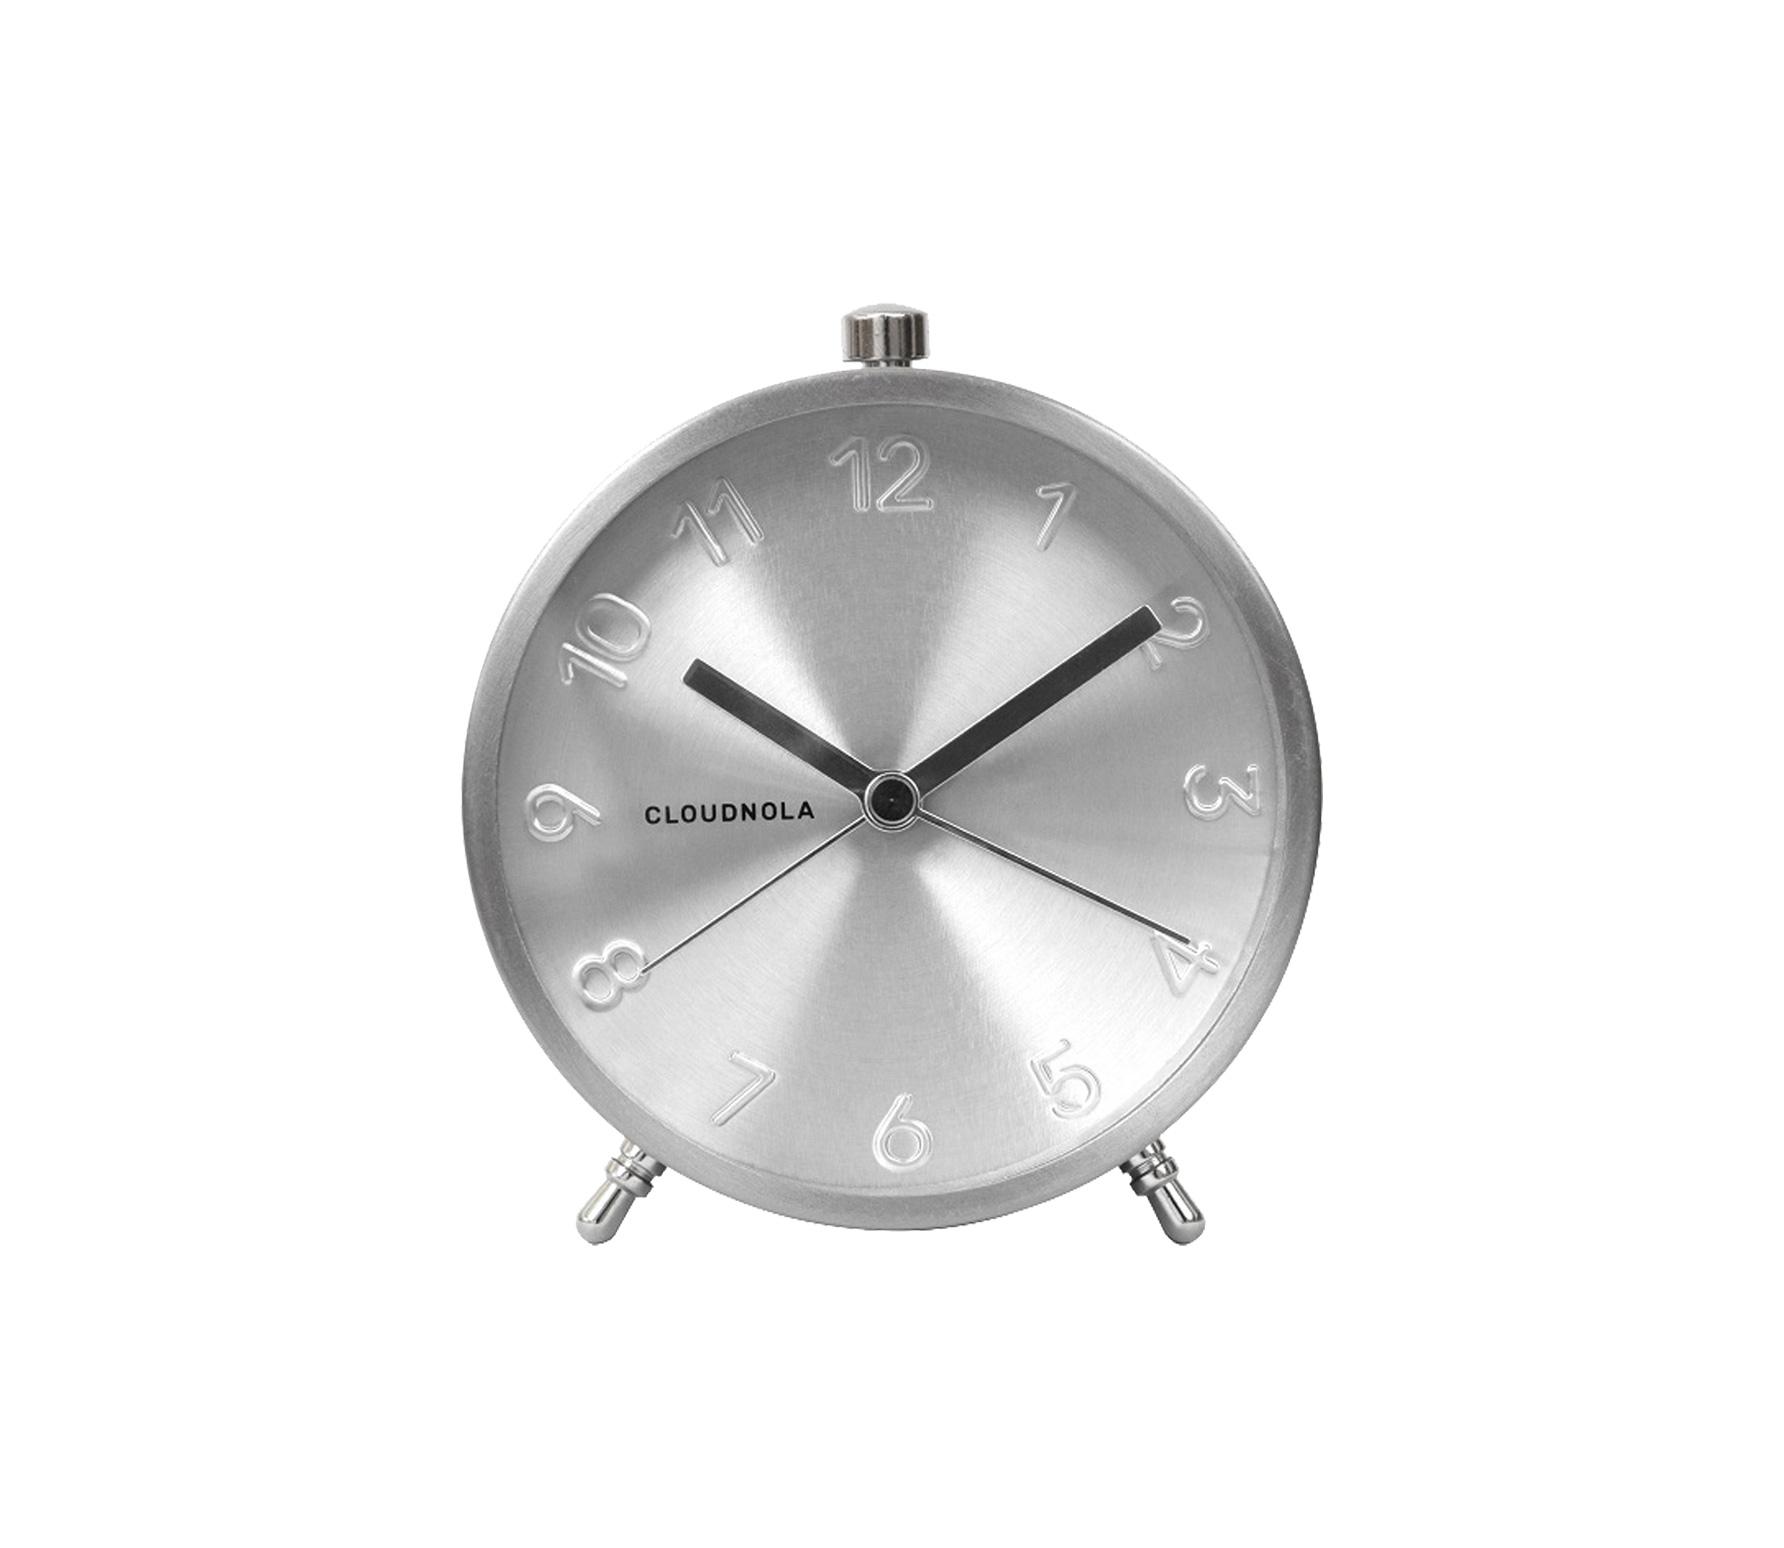 Cloudnola Glam Alarm klok silver vrijstaand